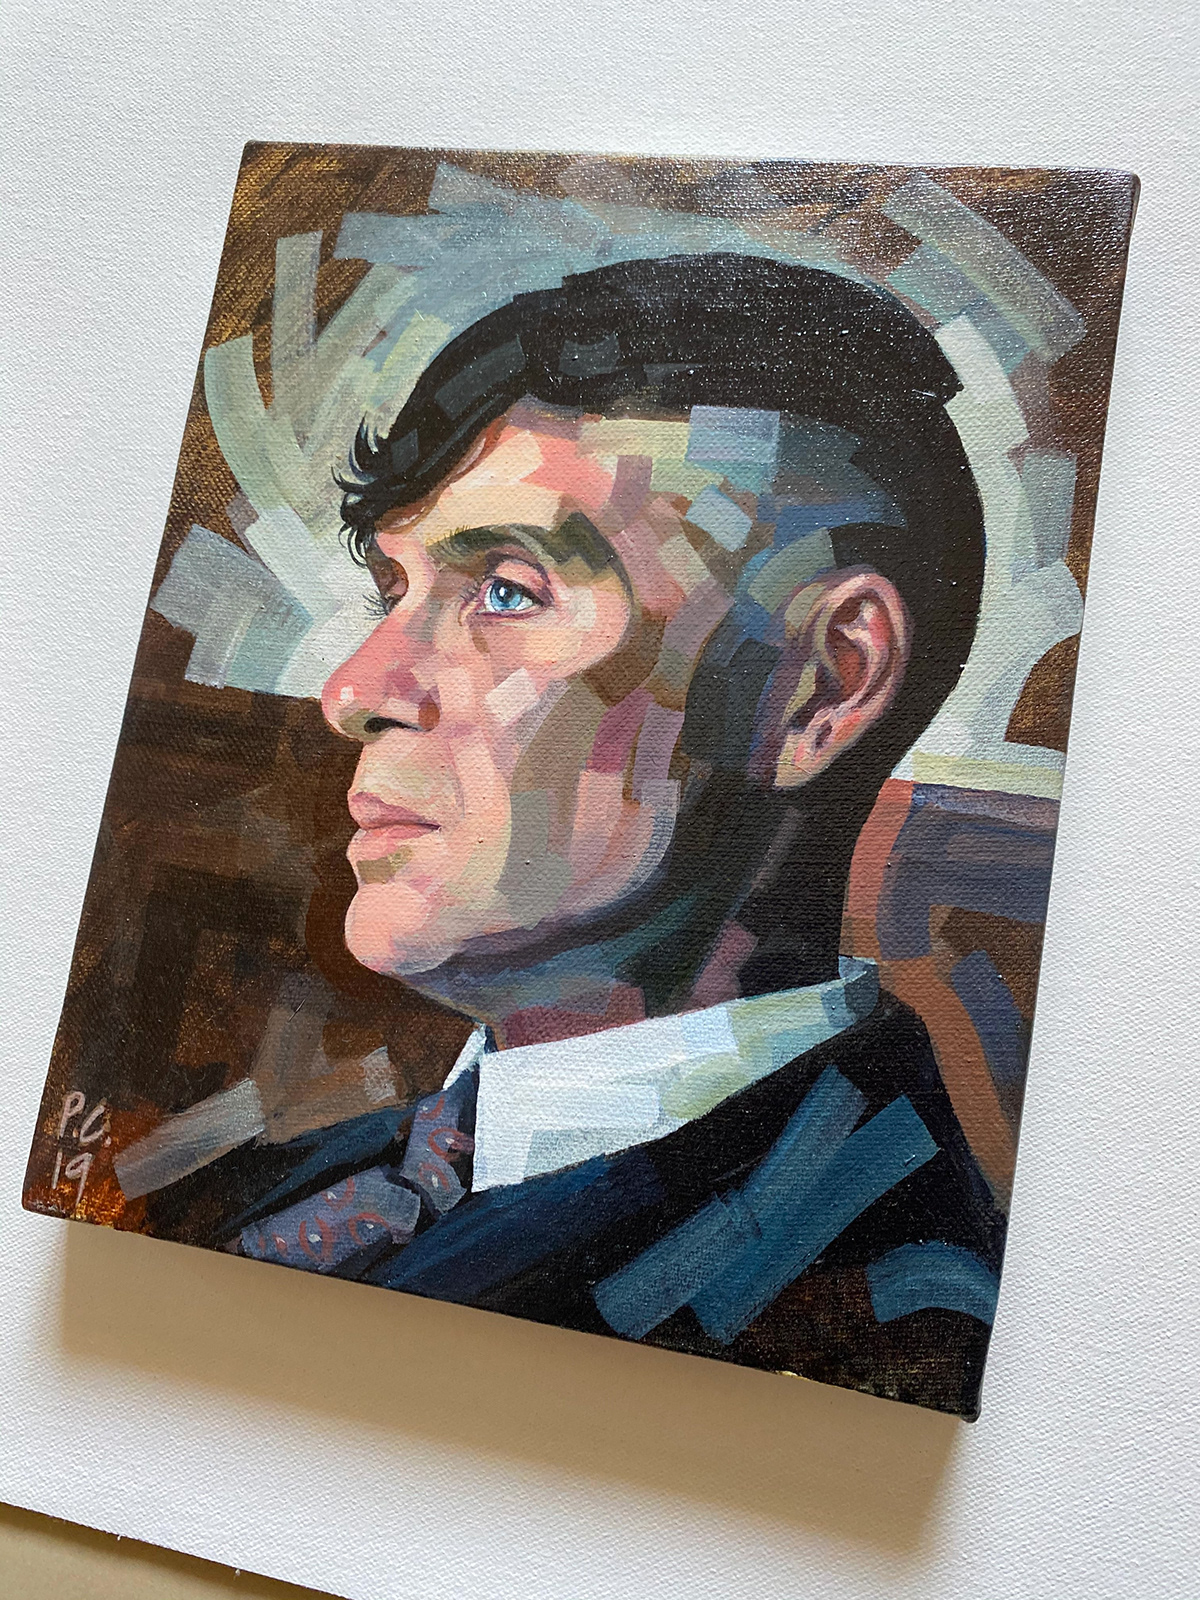 acrylic painting art brushstrokes Drawing  ILLUSTRATION  painting   Peaky Blinders portrait portrait art Thomas Shelby